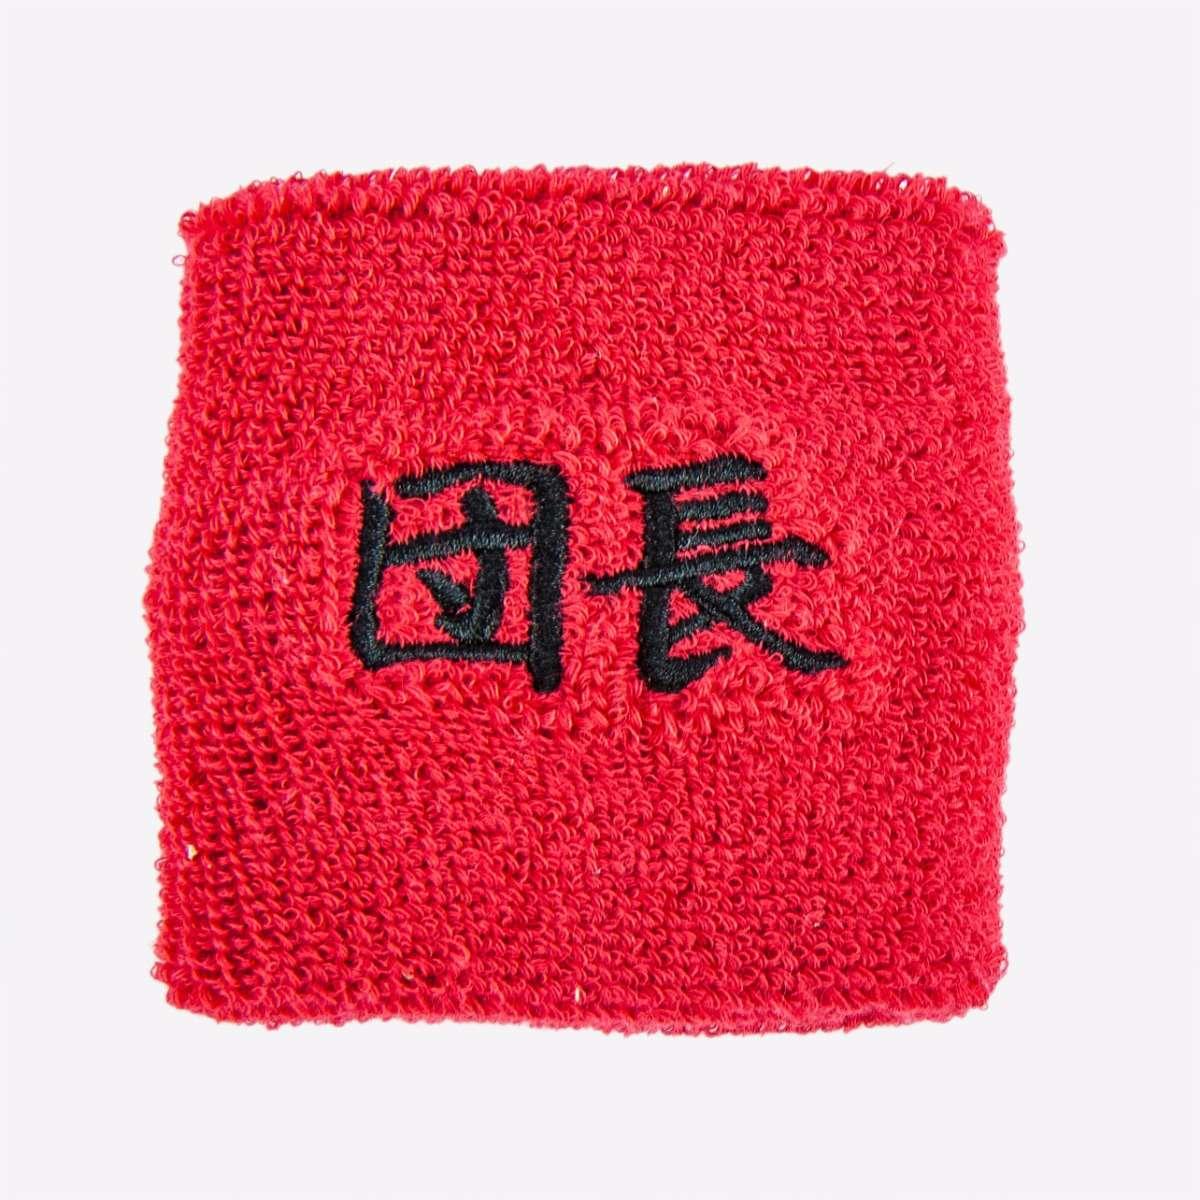 Club Leader Wristband accessories